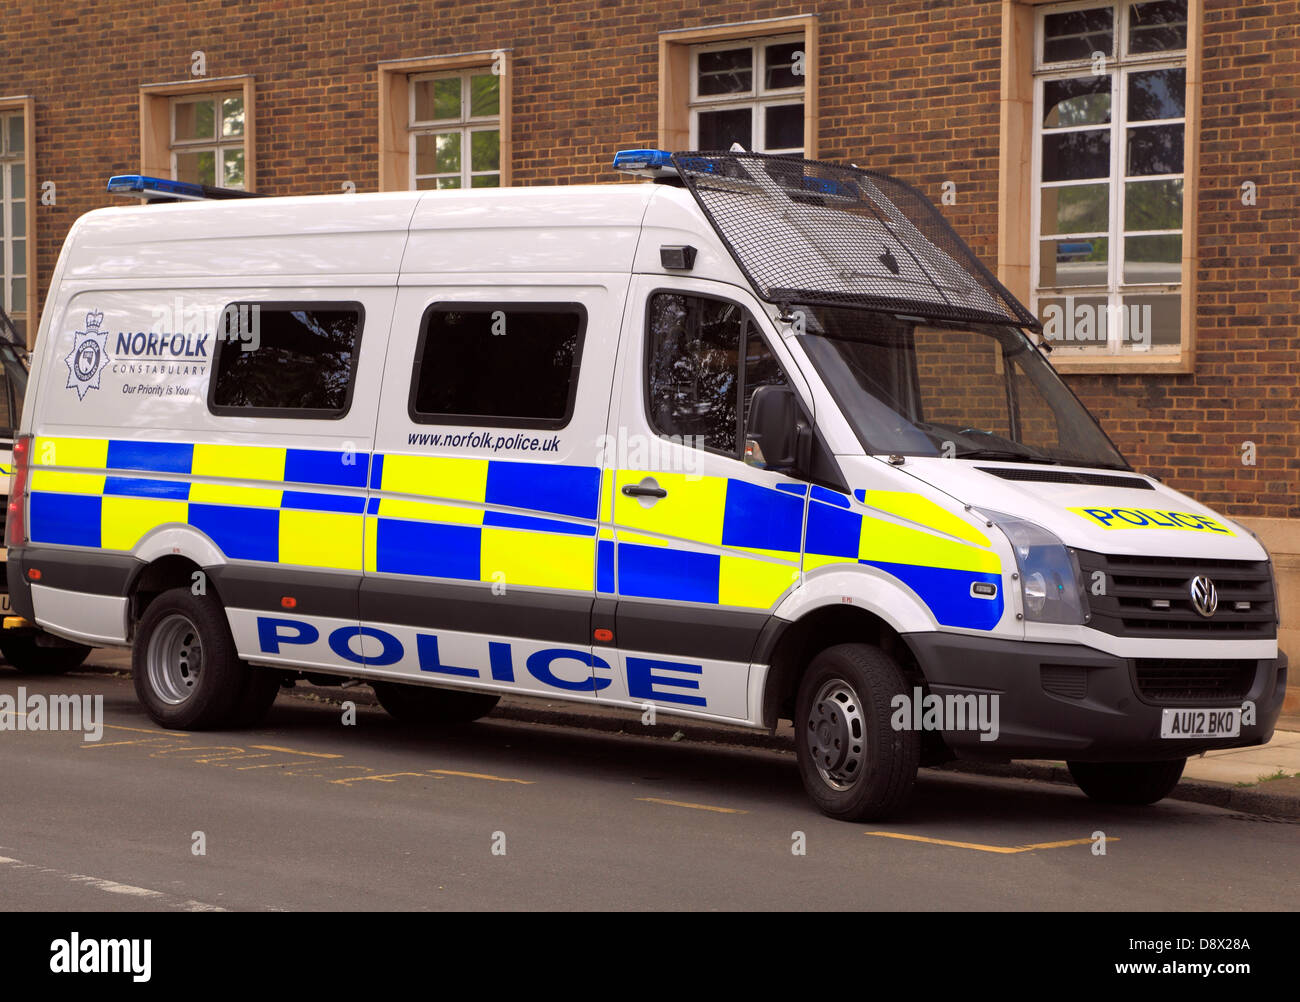 Norfolk Constabulary, Polizei-Transporter, Fahrzeug, Fahrzeuge, England UK Stockbild